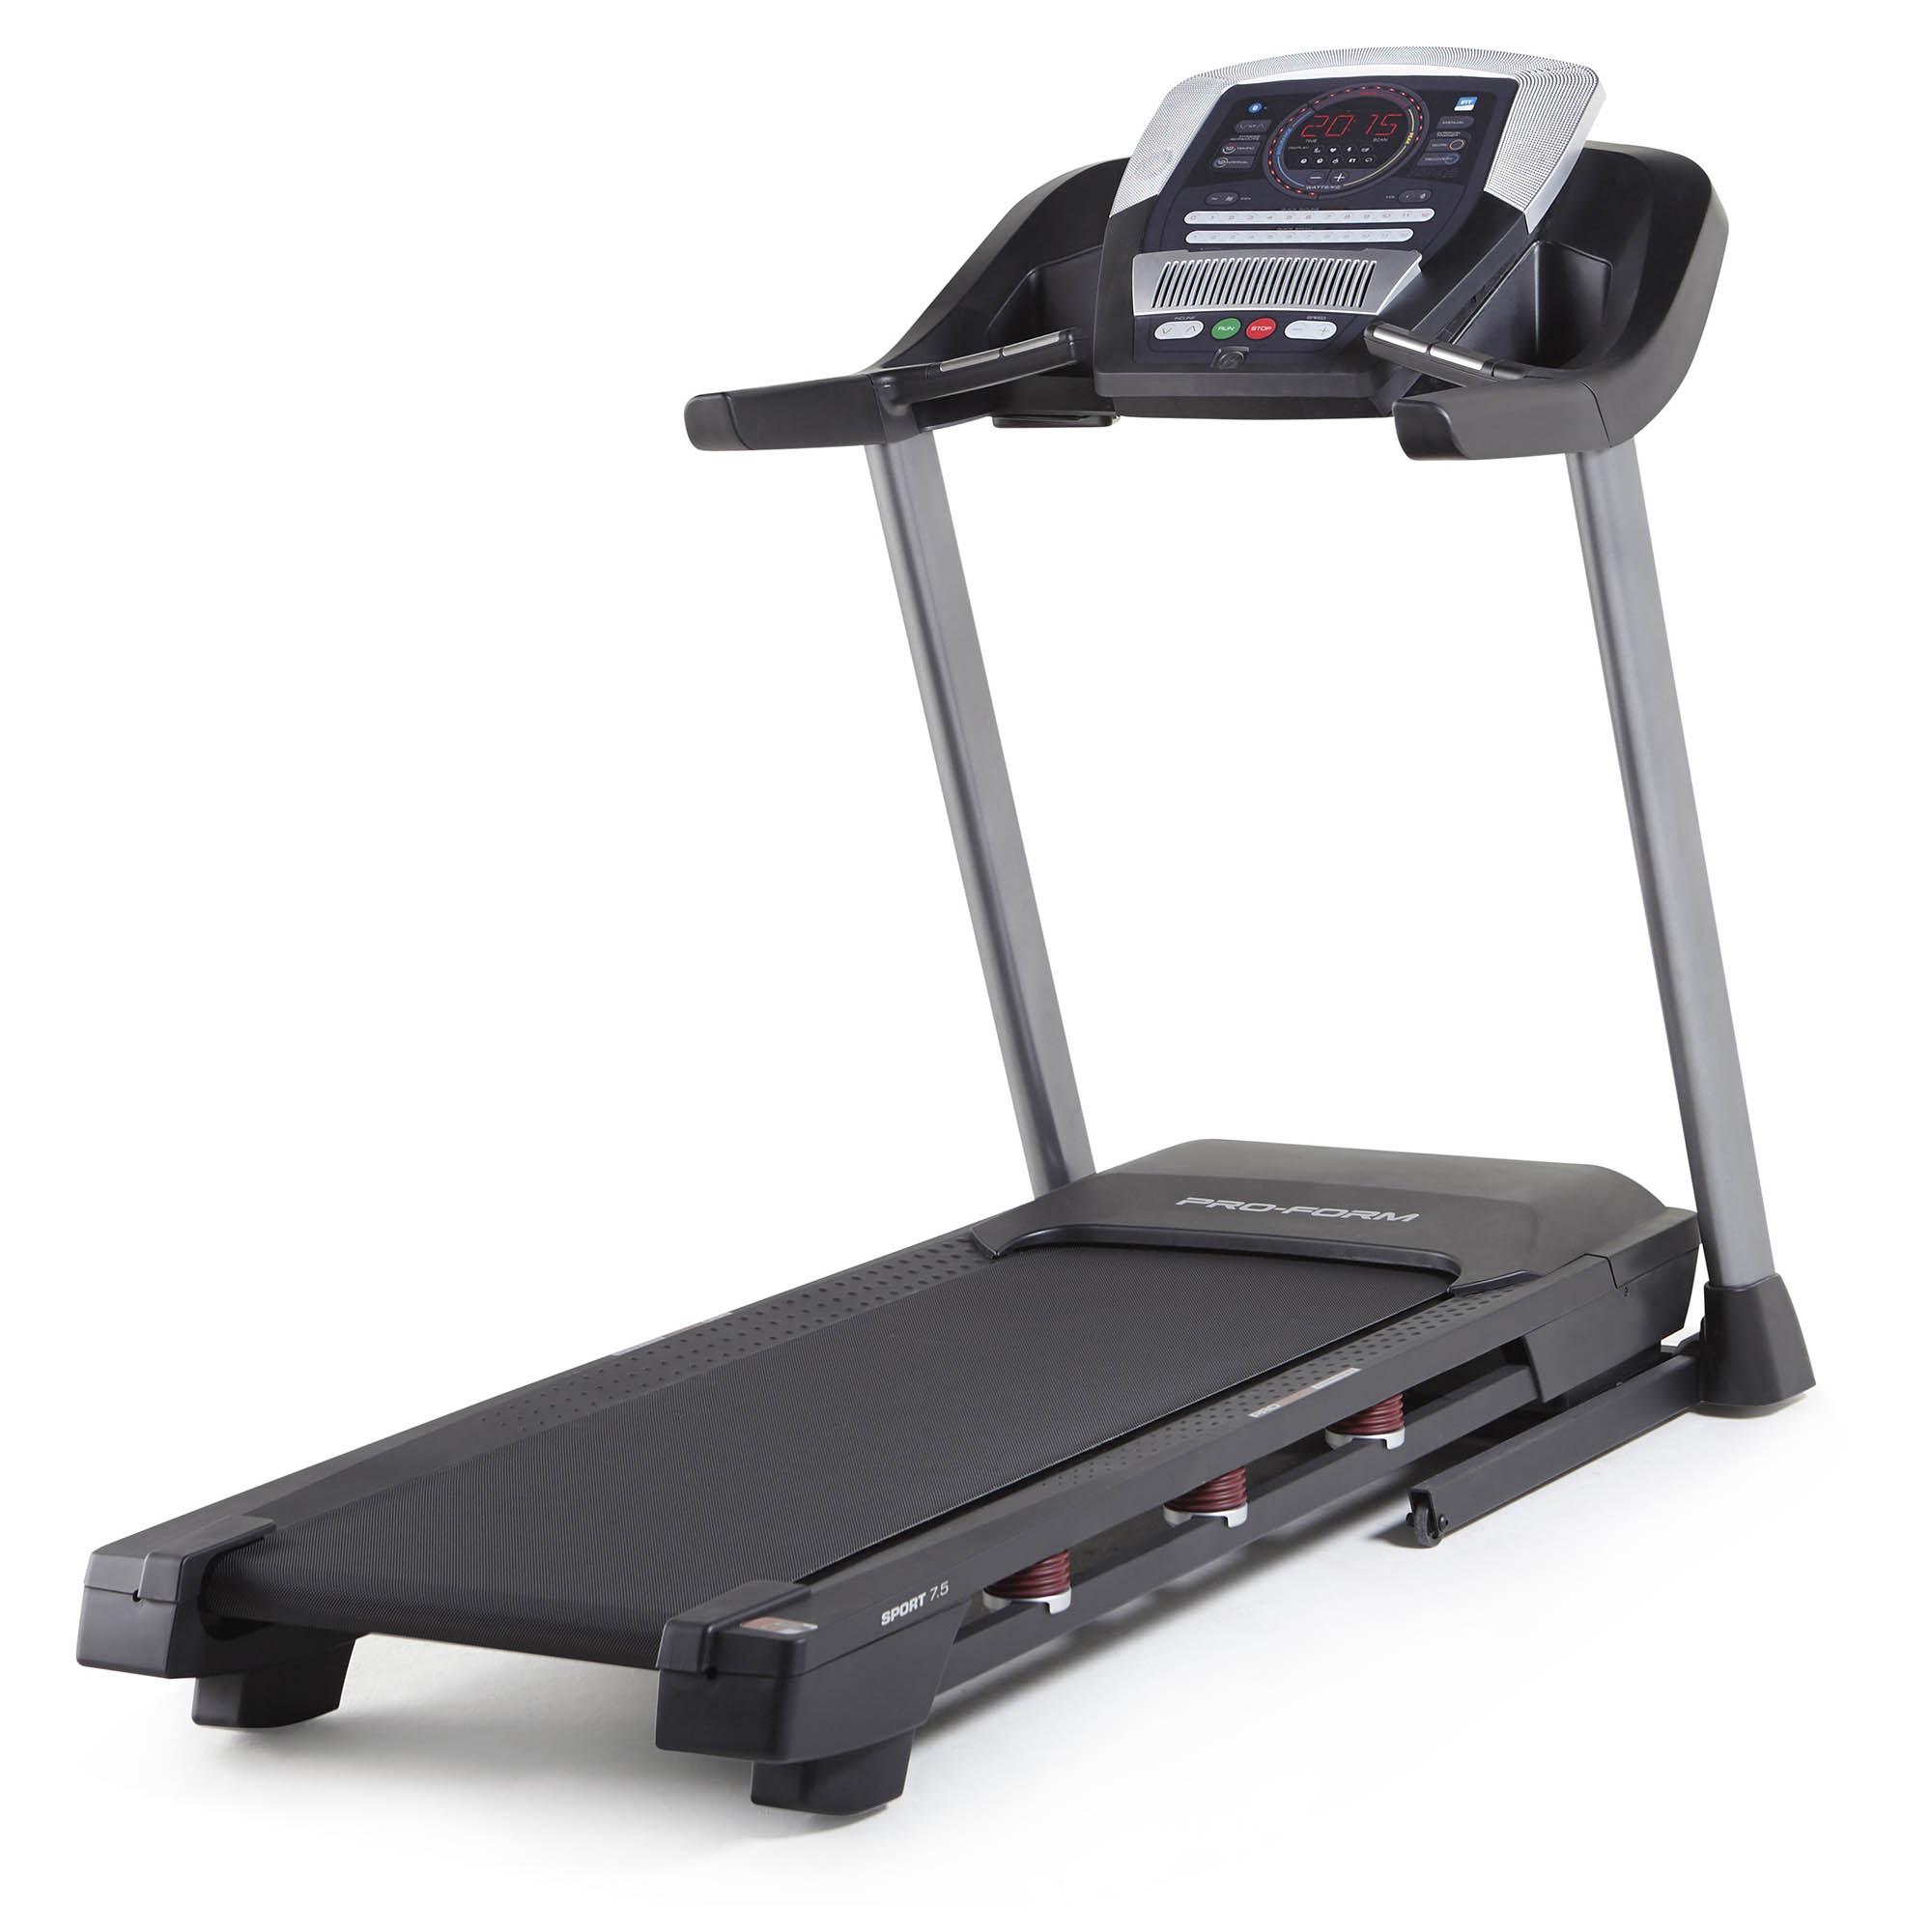 Nordictrack T14 Treadmill: Viavito LunaRun Fold Flat Treadmill